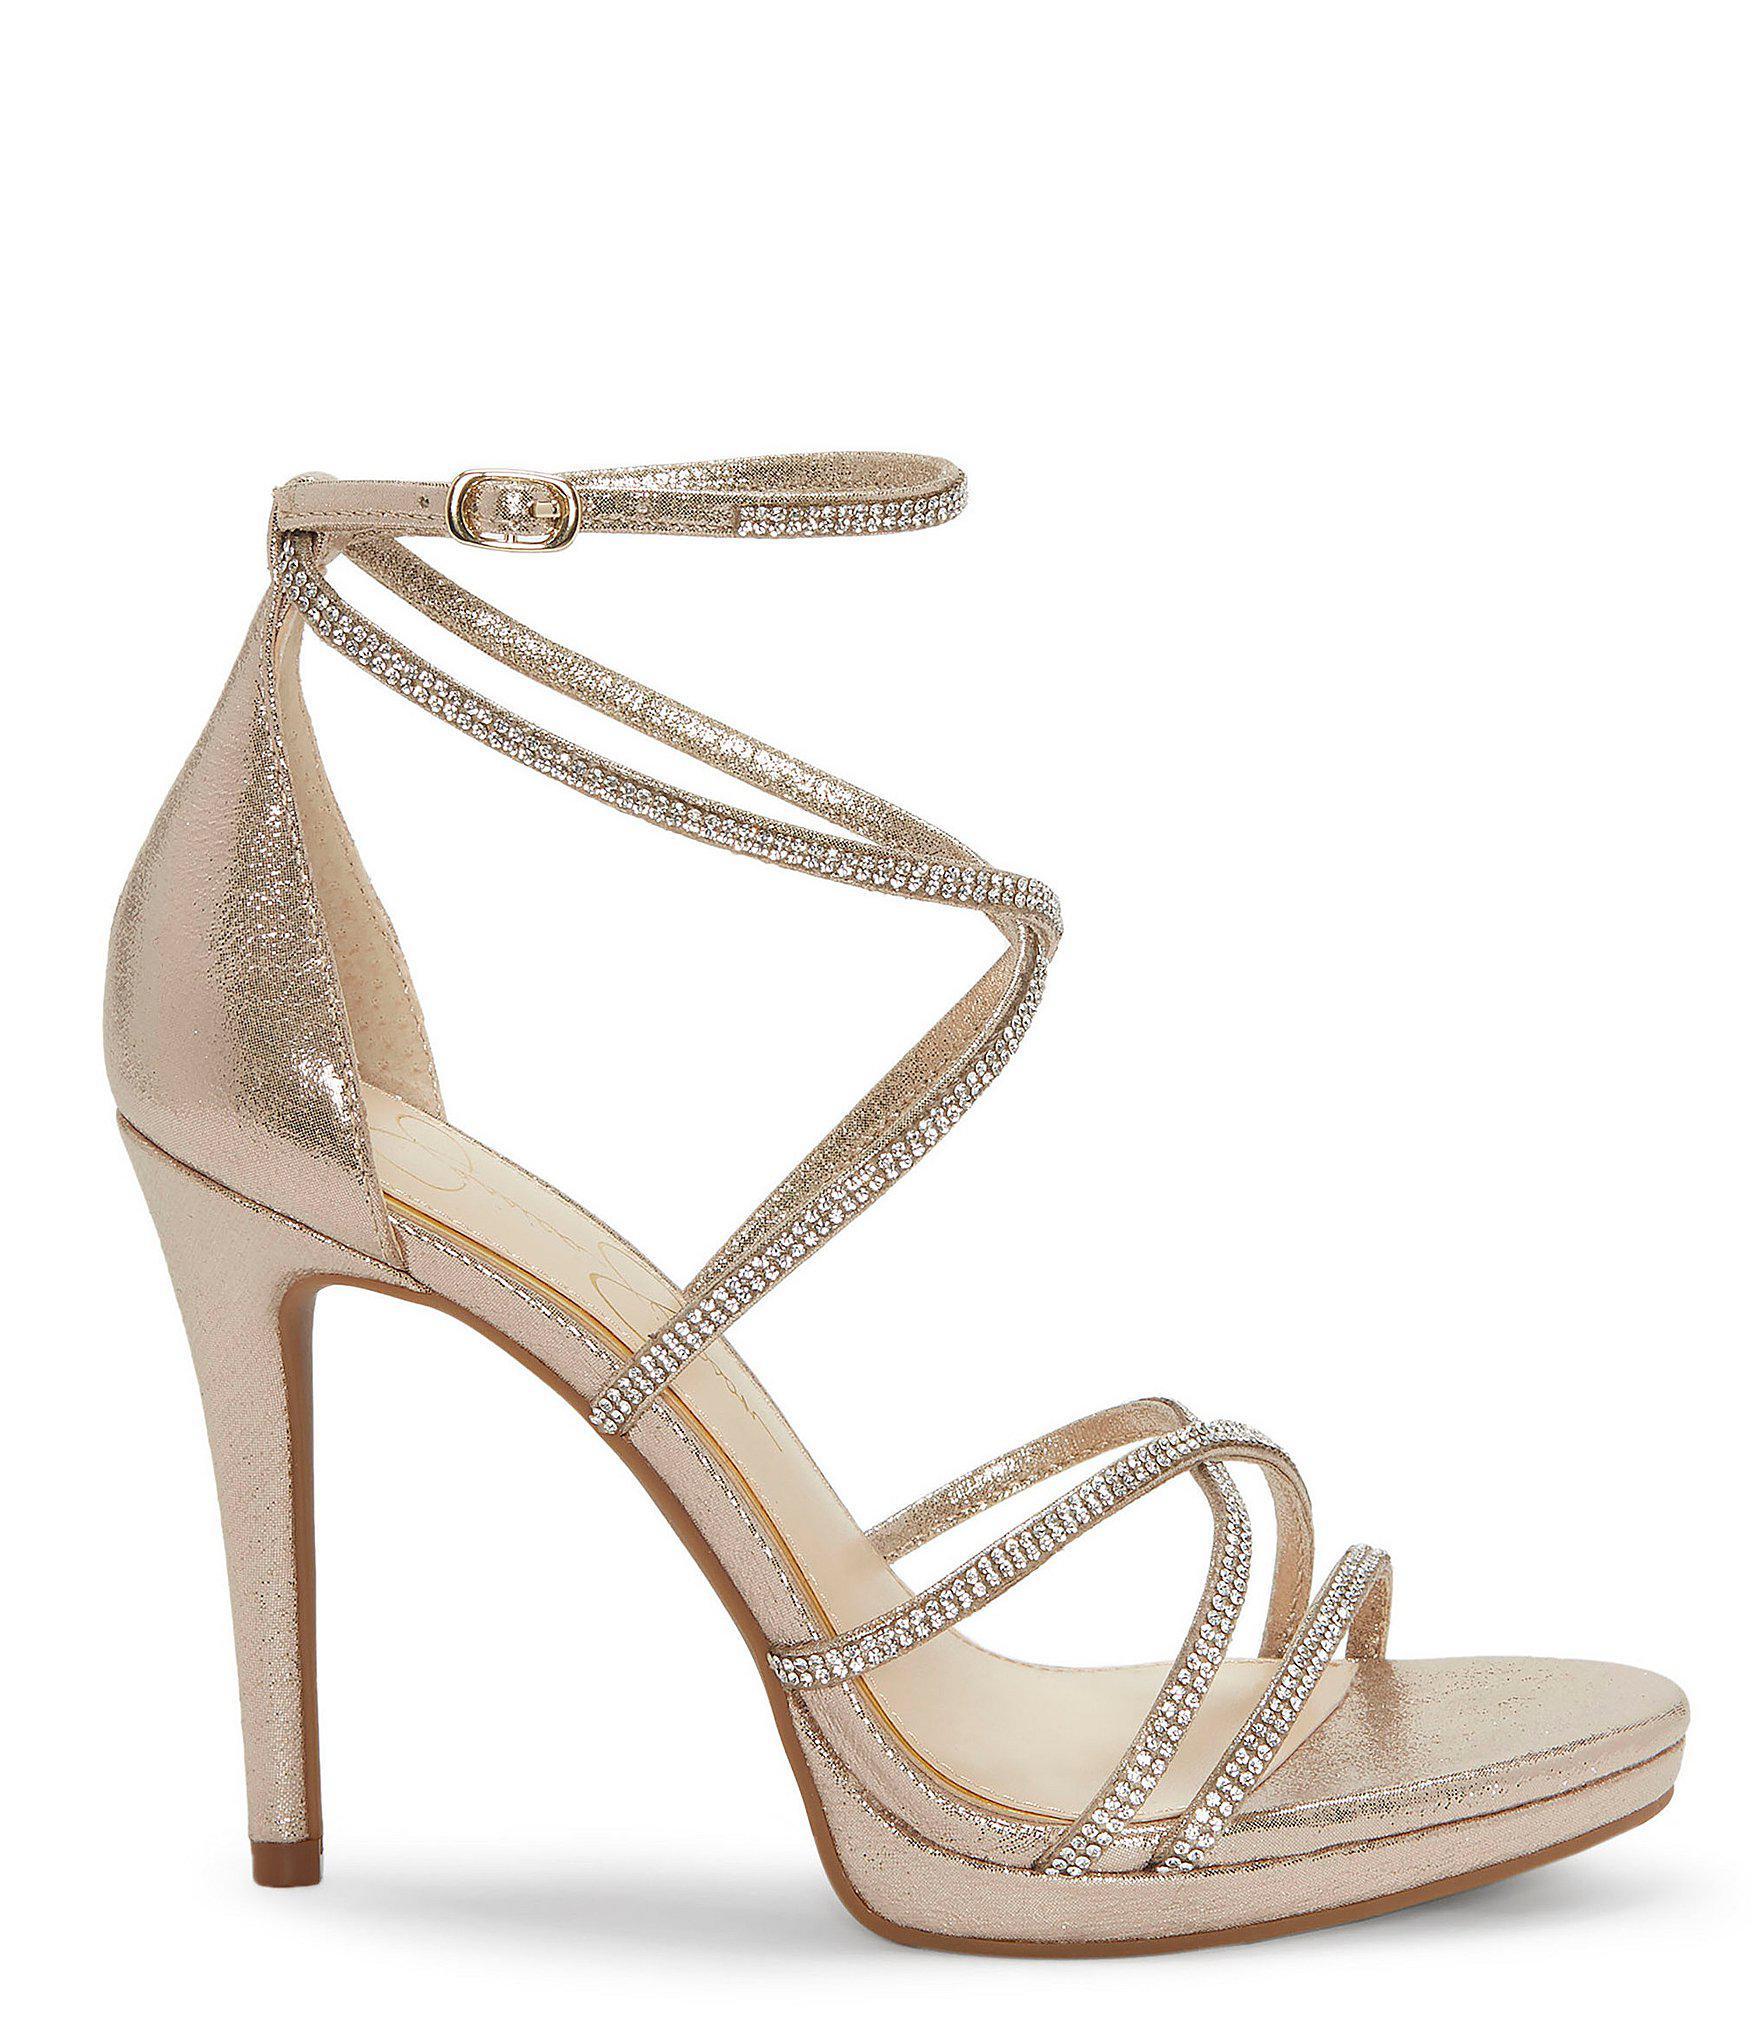 9cd7321a3b7 Jessica Simpson - Metallic Jaeya Rhinestone Strappy Dress Sandals - Lyst.  View fullscreen